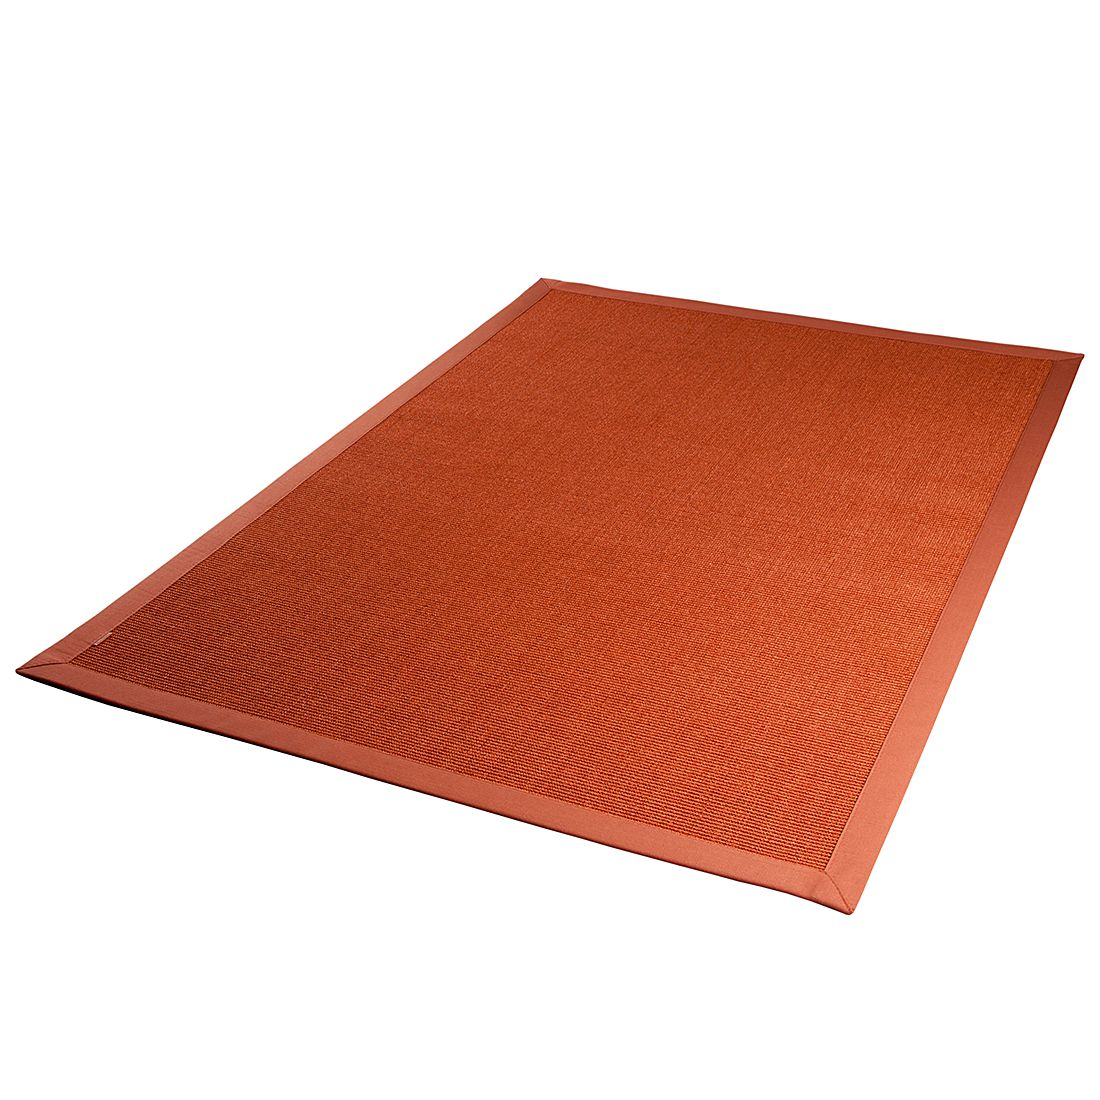 Teppich Mara A2 – Terrakotta – 170 x 230 cm, DEKOWE kaufen